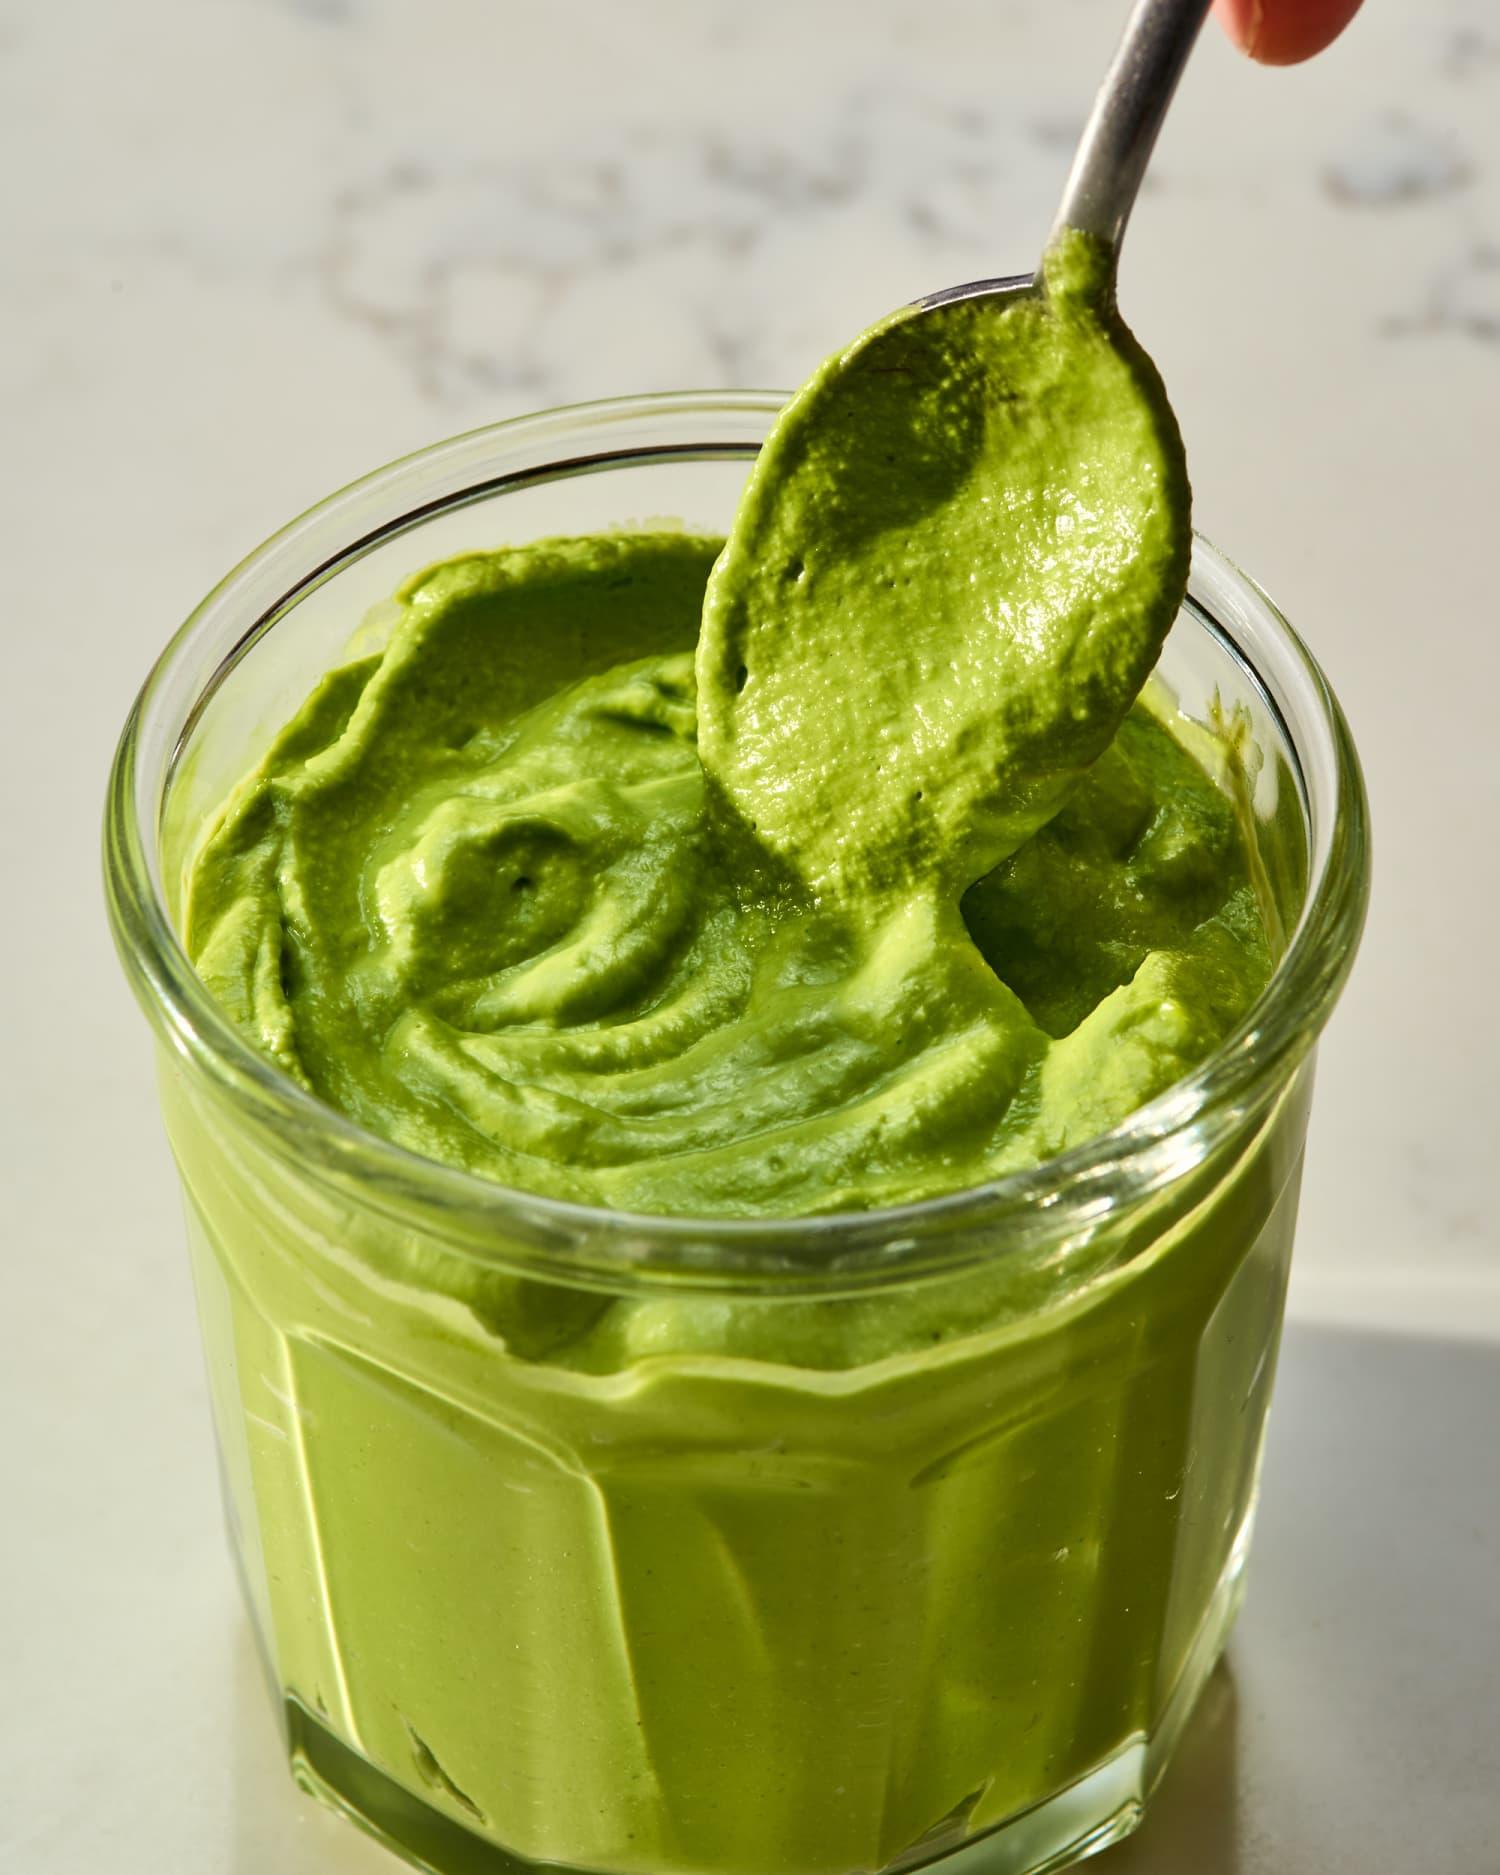 I Always Make a Double Batch of This Green Goddess Pesto Sauce